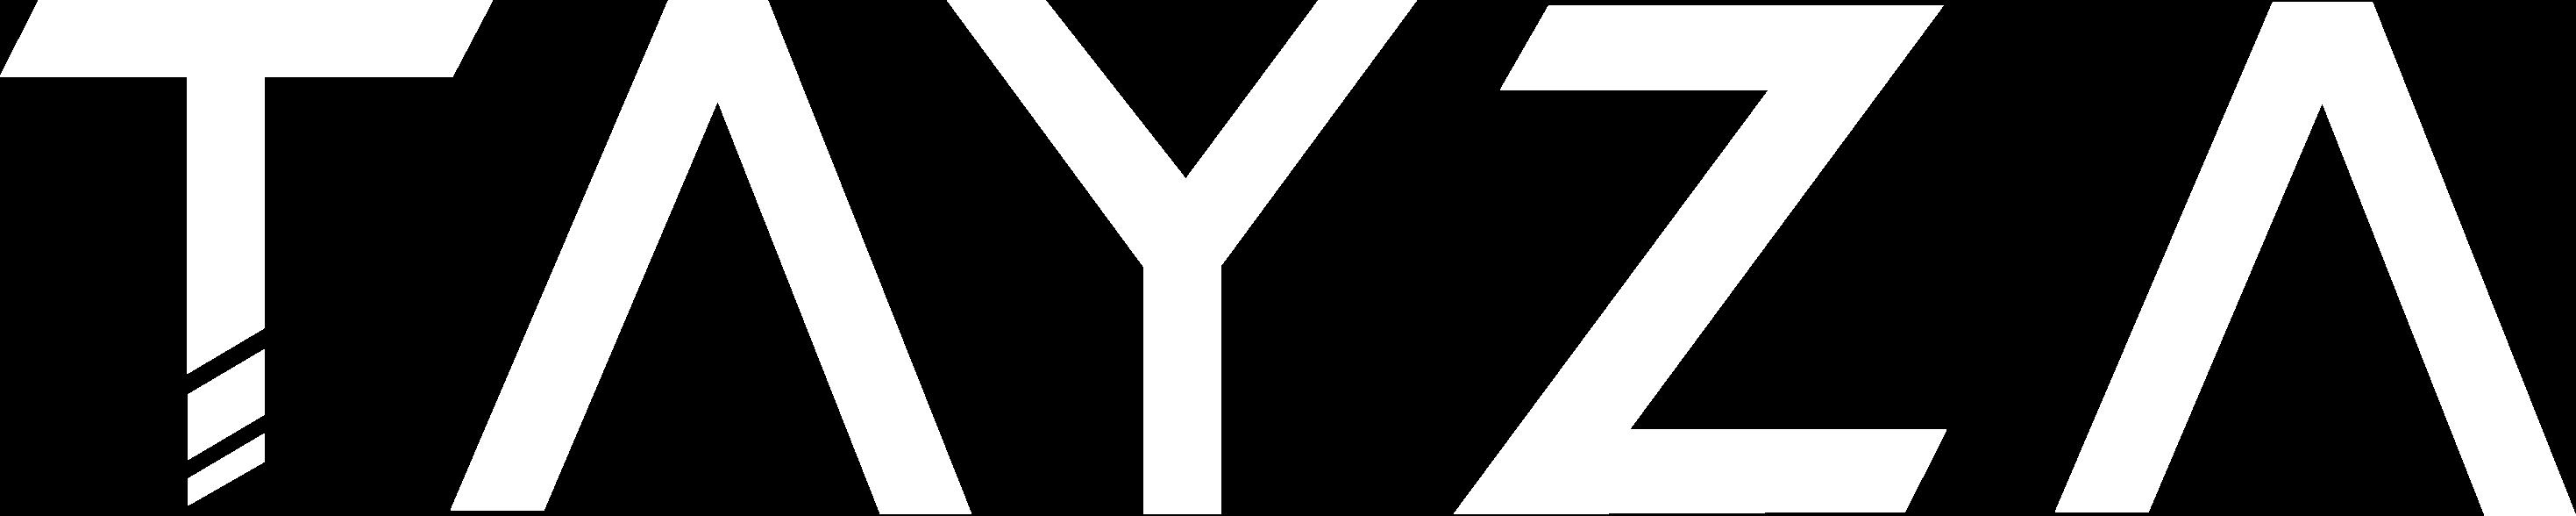 Tayza logo